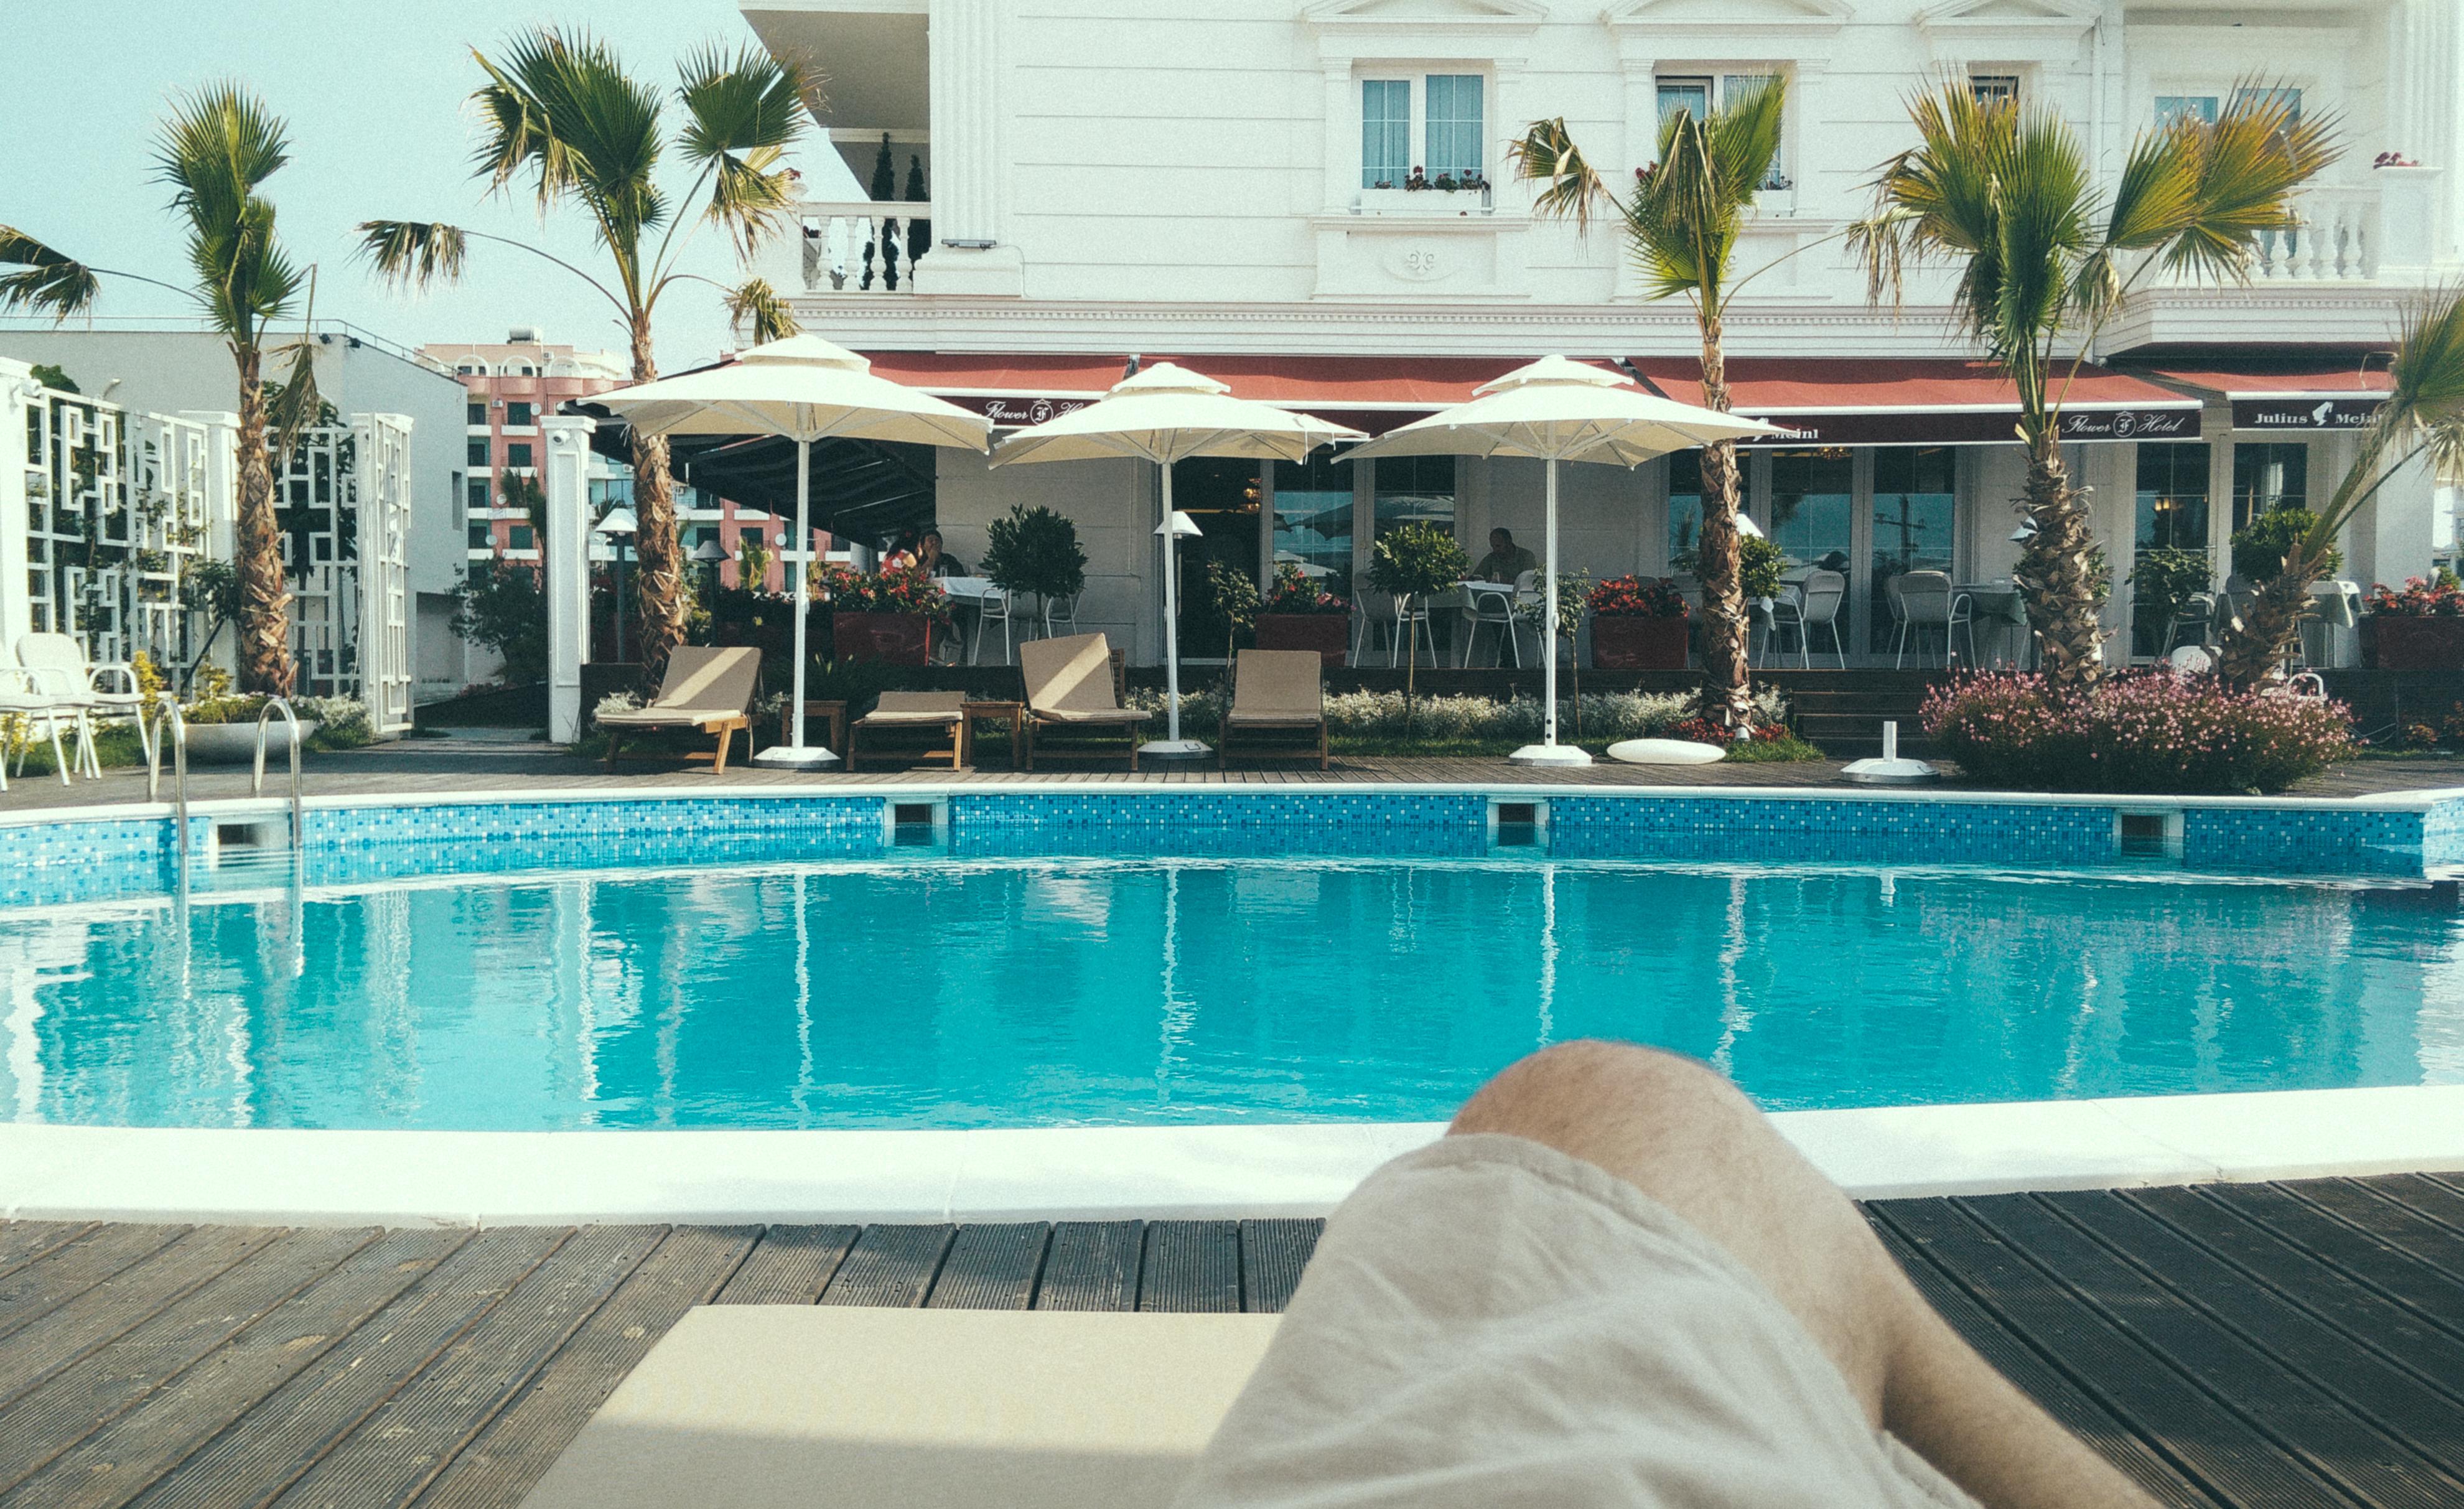 hotelvsbed